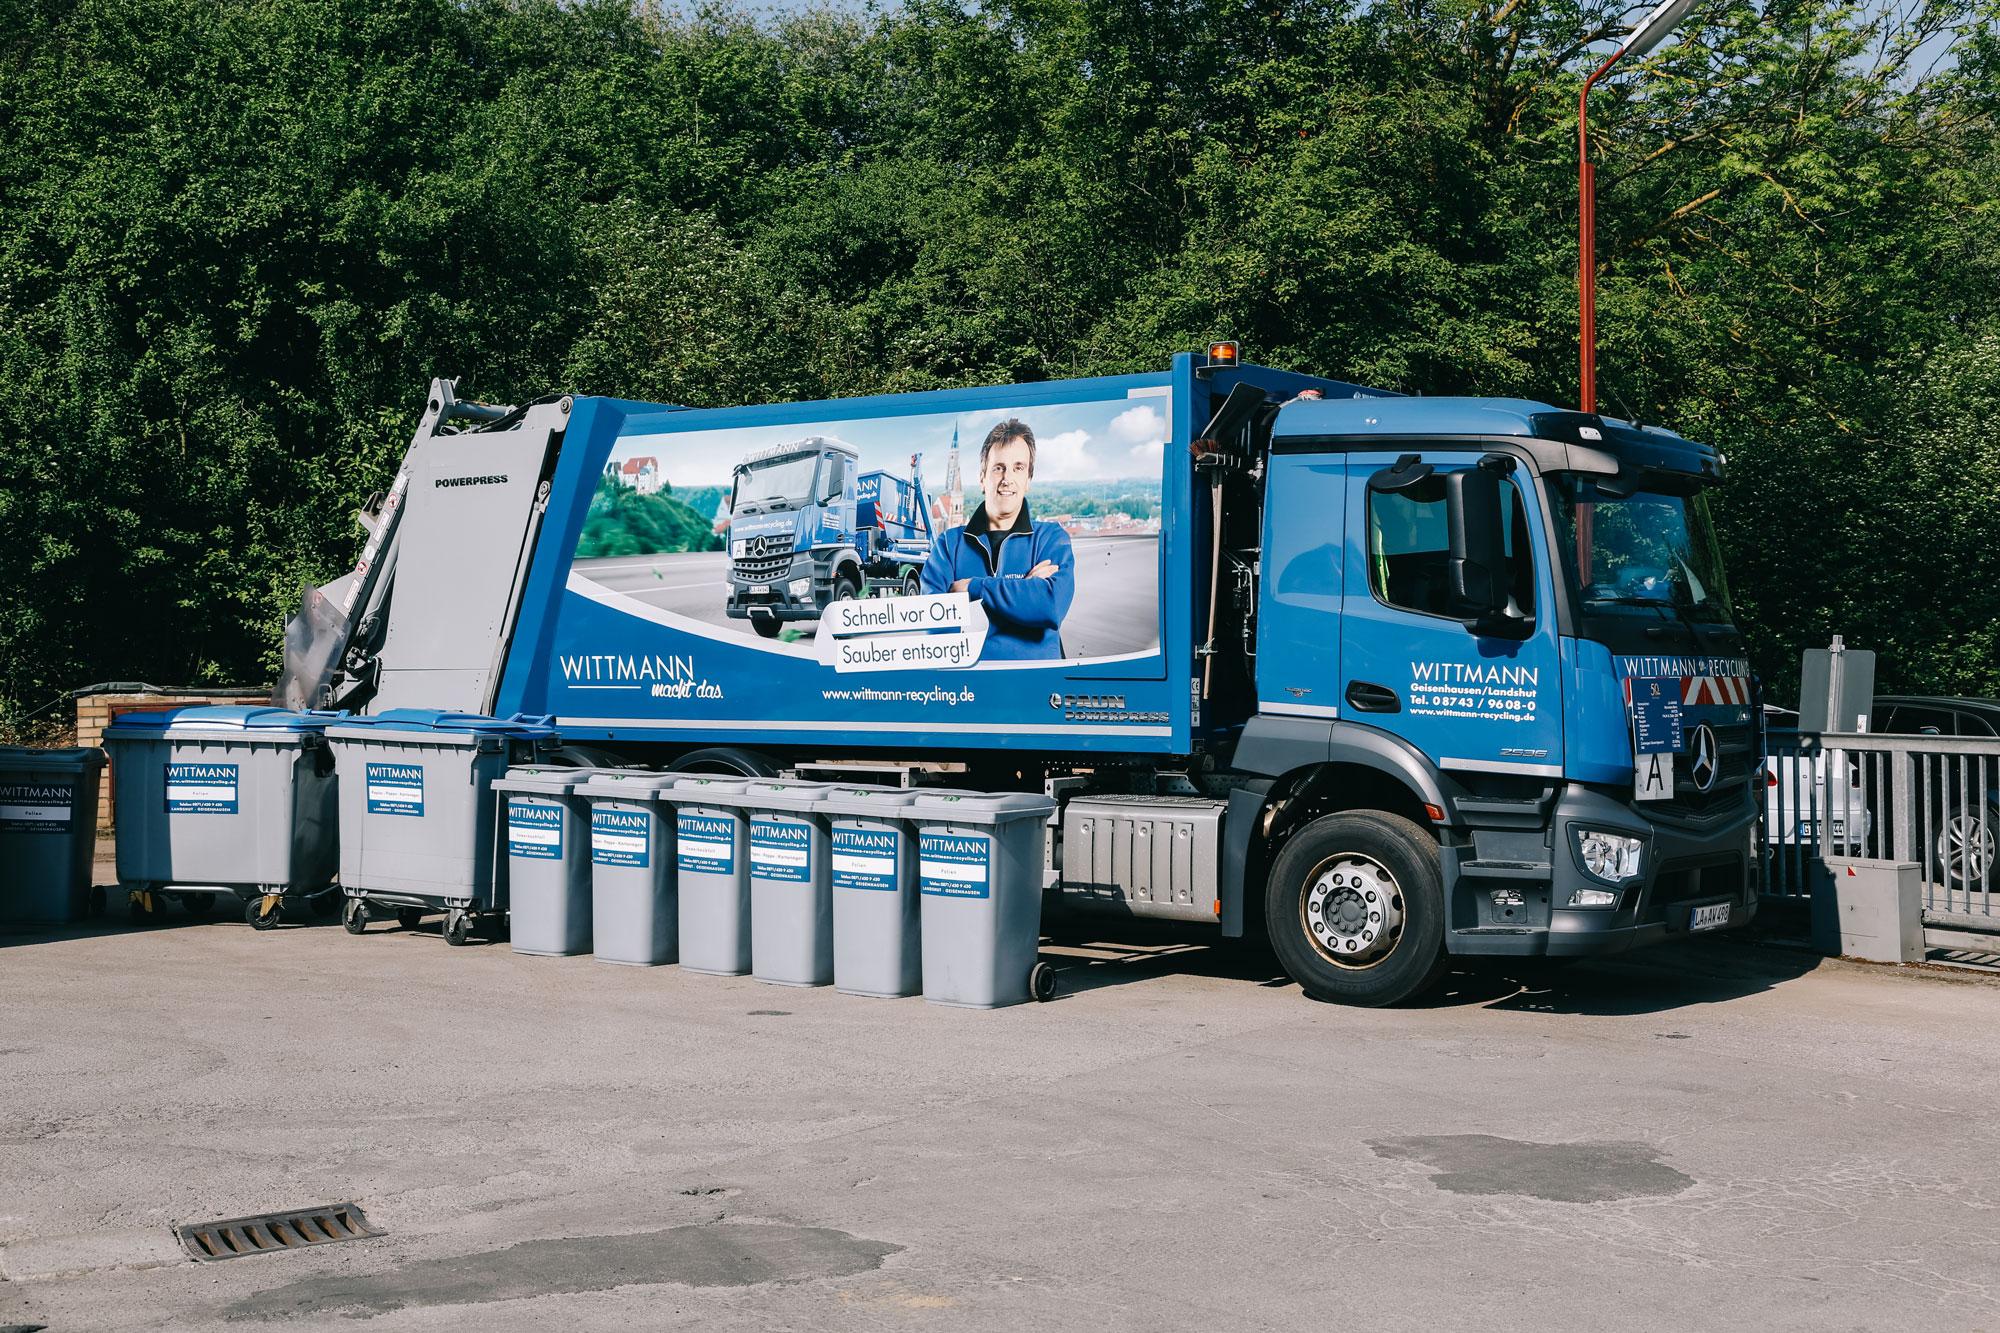 Ein Wittmann Recycling Laster